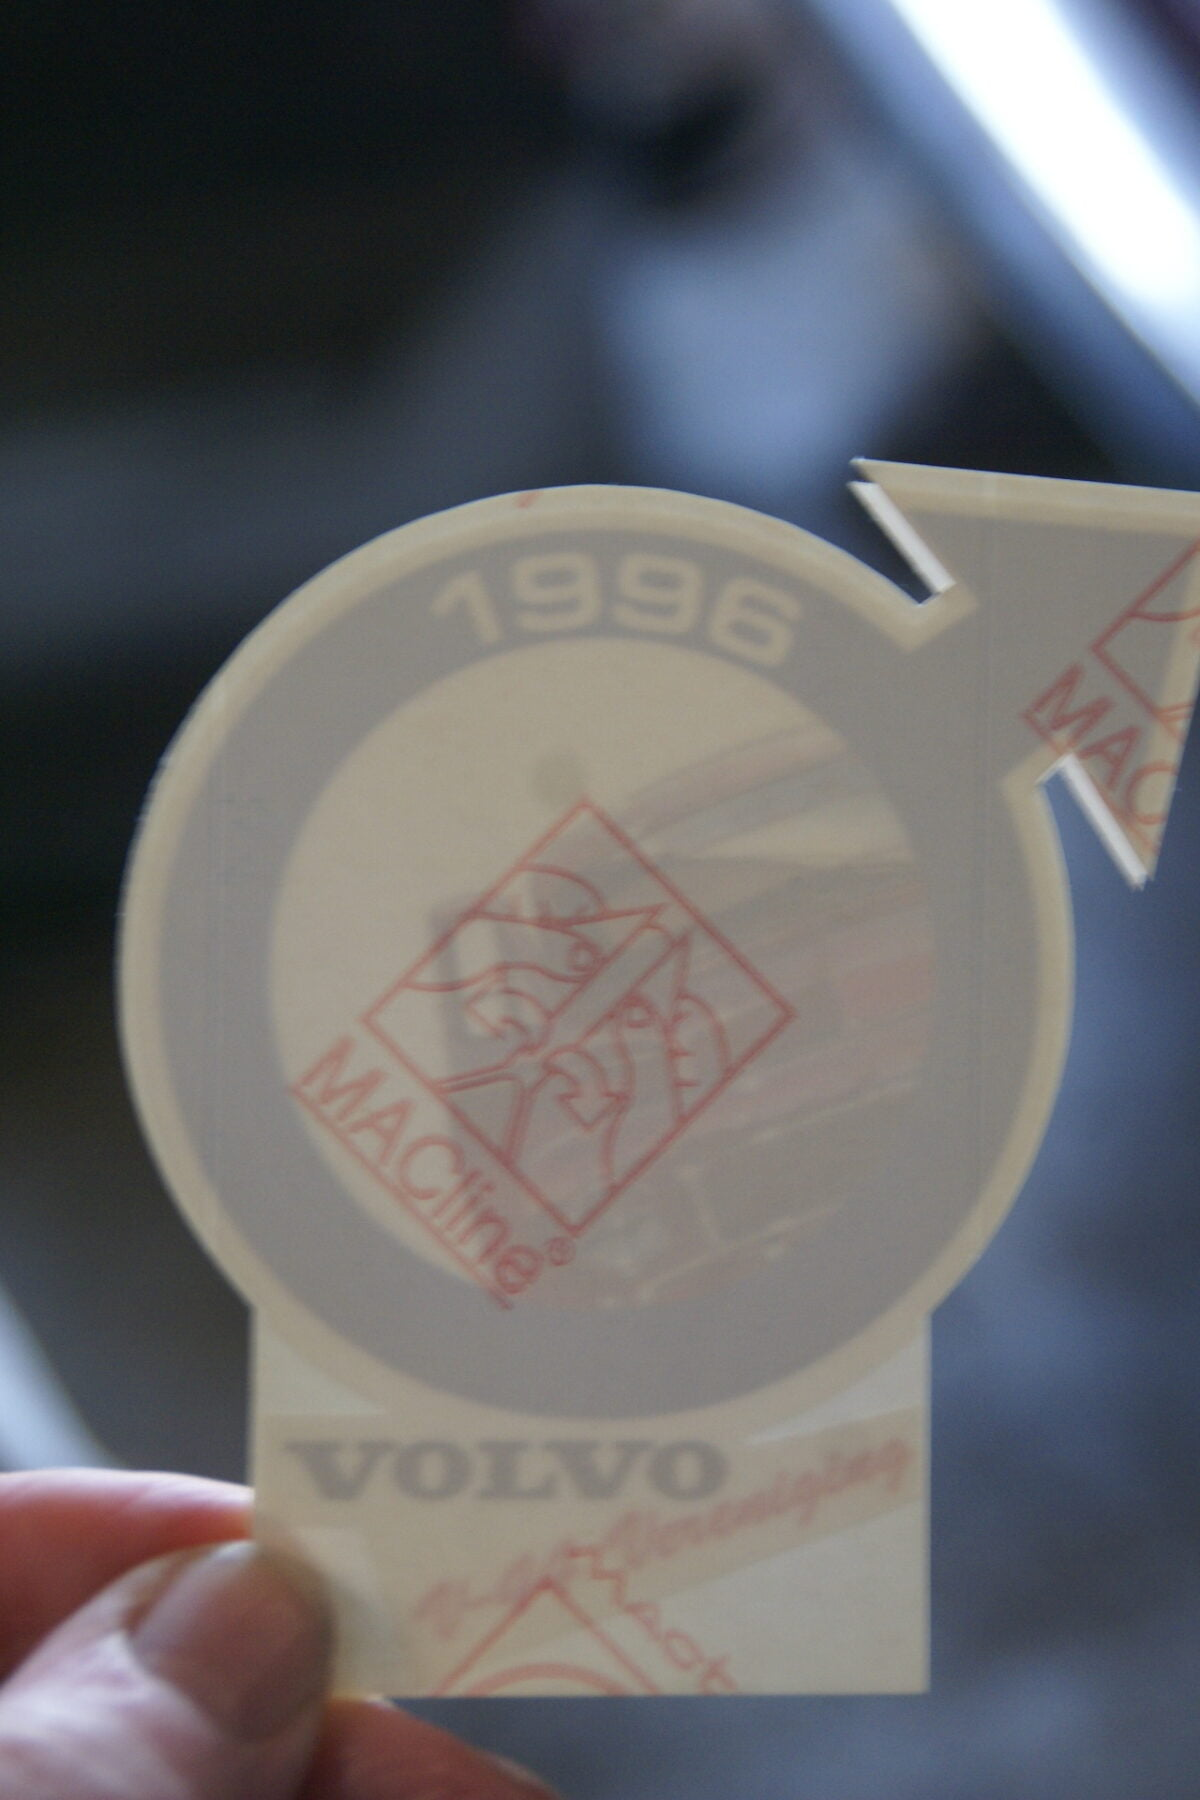 DSC02522 1996 sticker Volvo V44 Vereniging NOS-c190218d